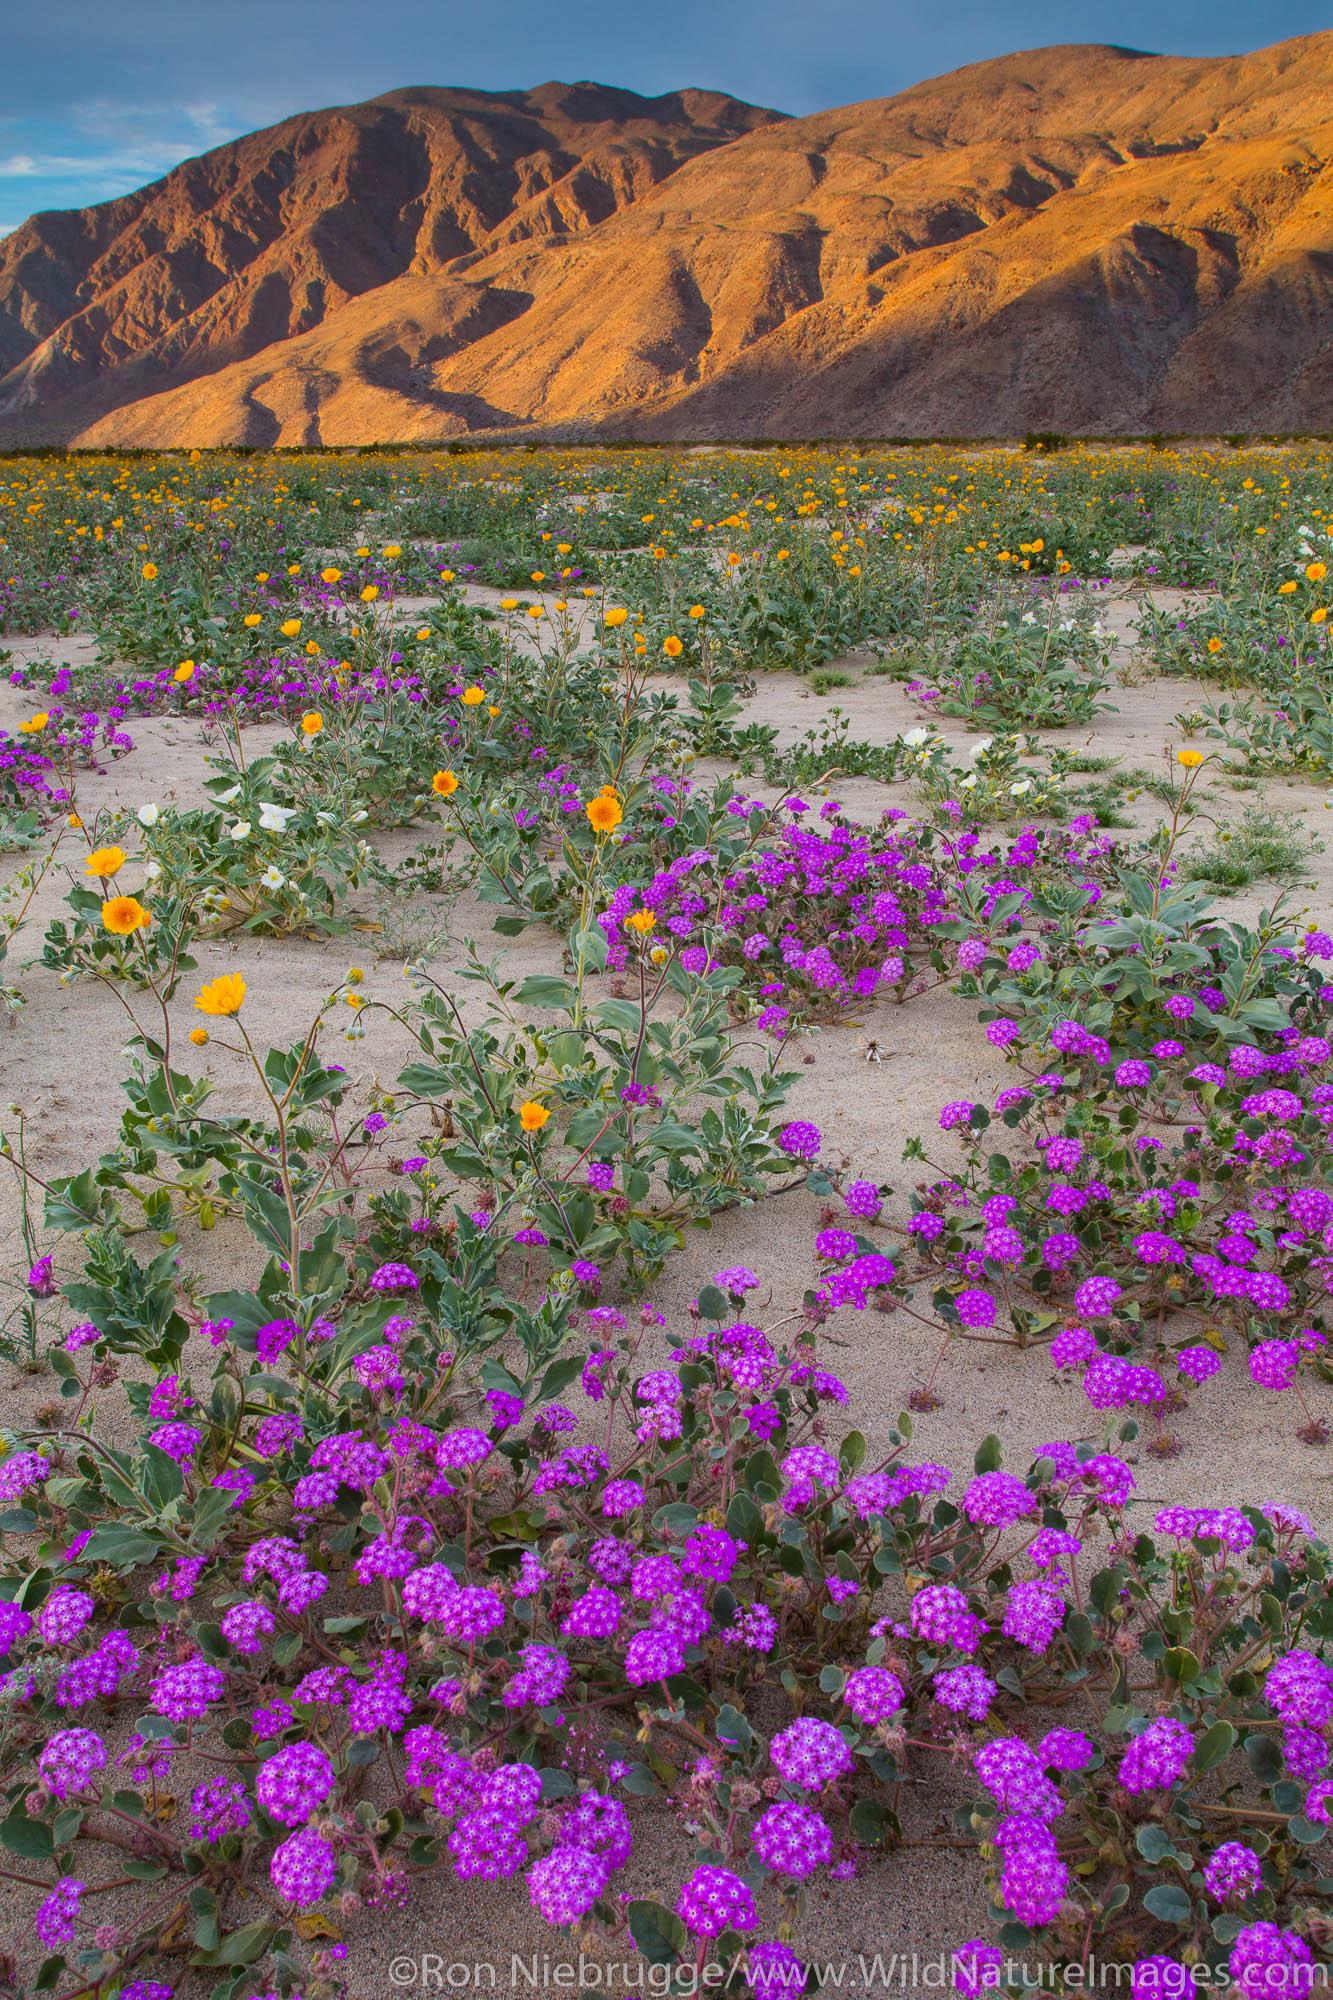 Fields of wildflowers bloom in Anza-Borrego Desert State Park, California.